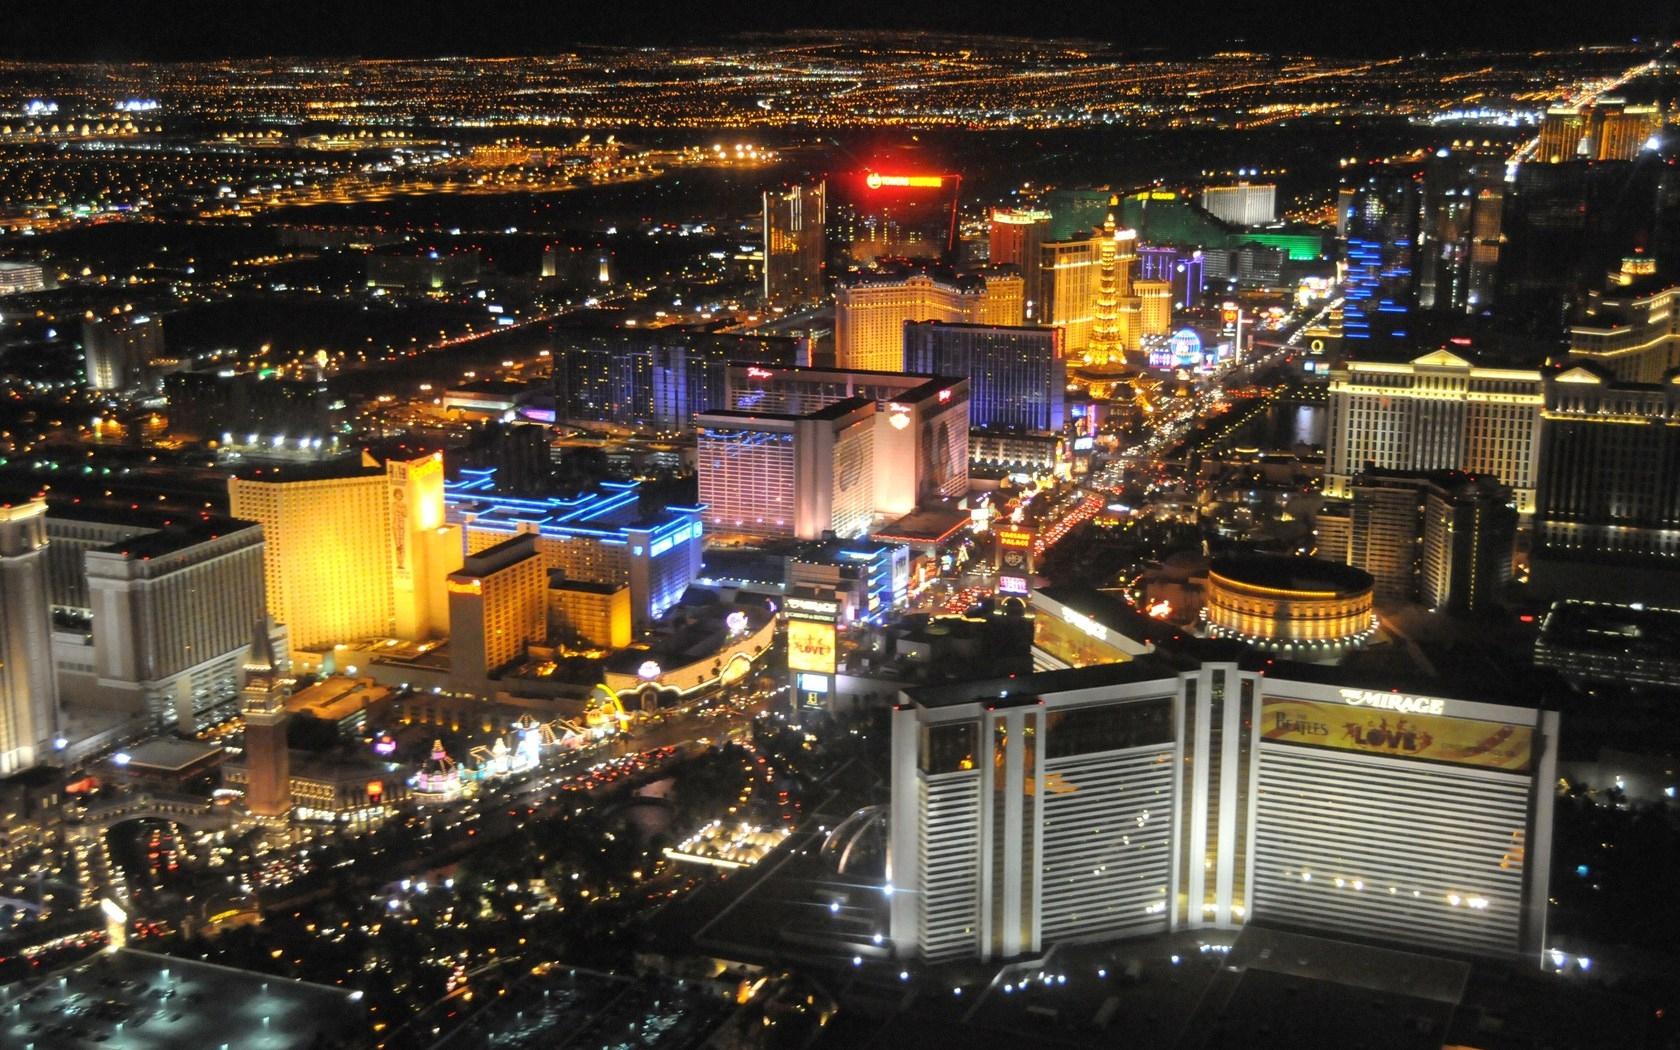 Wallpaper Landscape Night City Las Vegas Metropolis